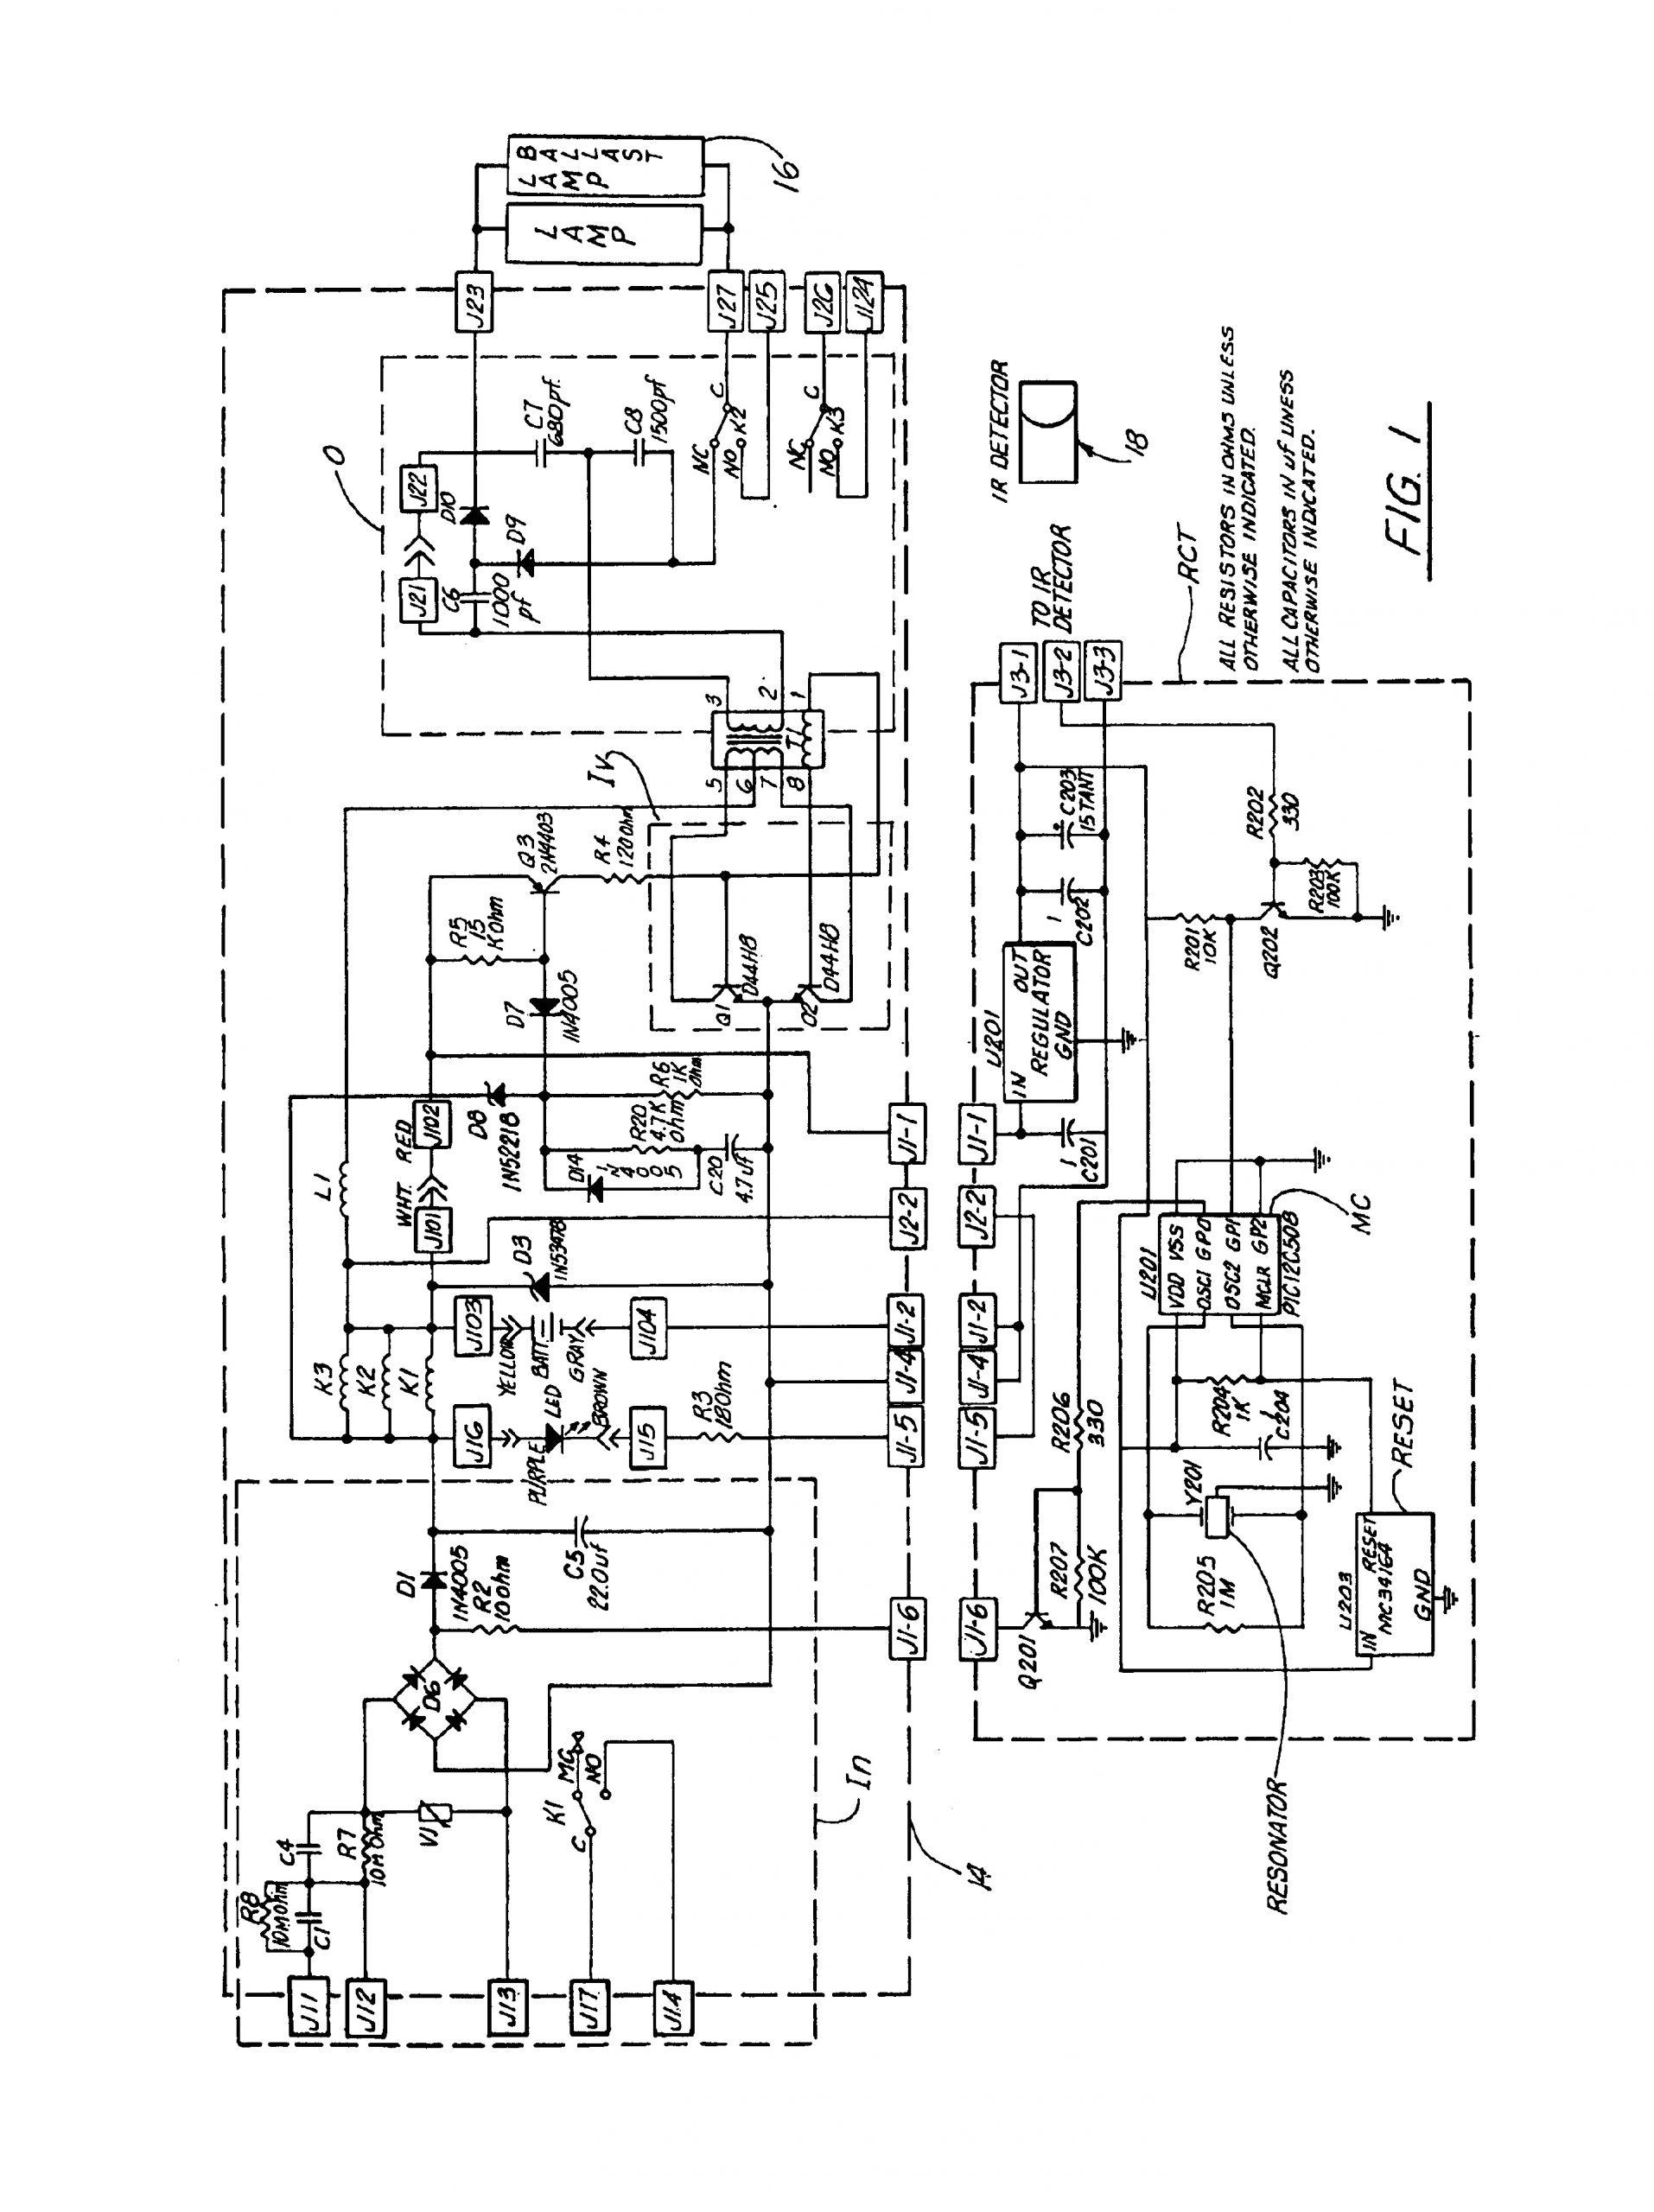 bodine emergency ballast wiring diagram bodine b100 fluorescent emergency ballast wiring diagram wiring of bodine emergency ballast wiring diagram jpg